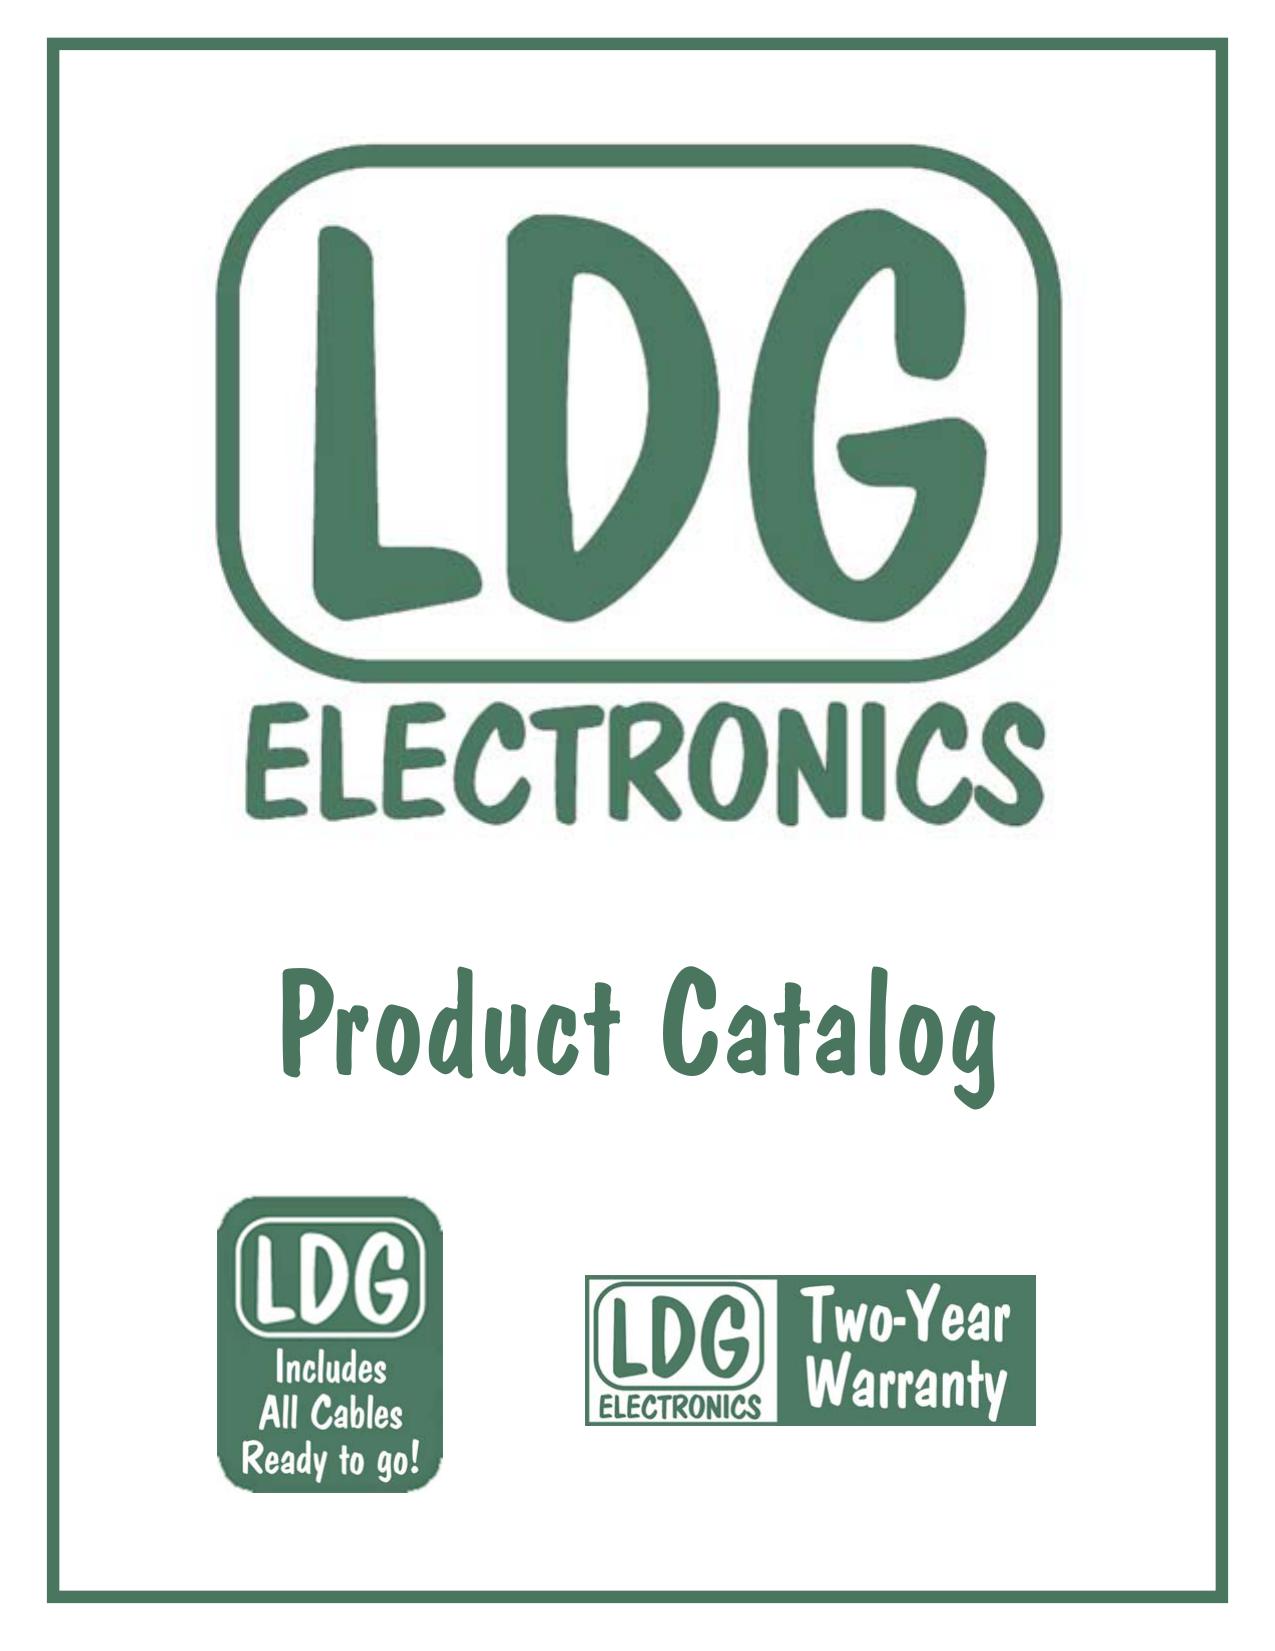 ldg cover pub - LDG Electronics | manualzz com